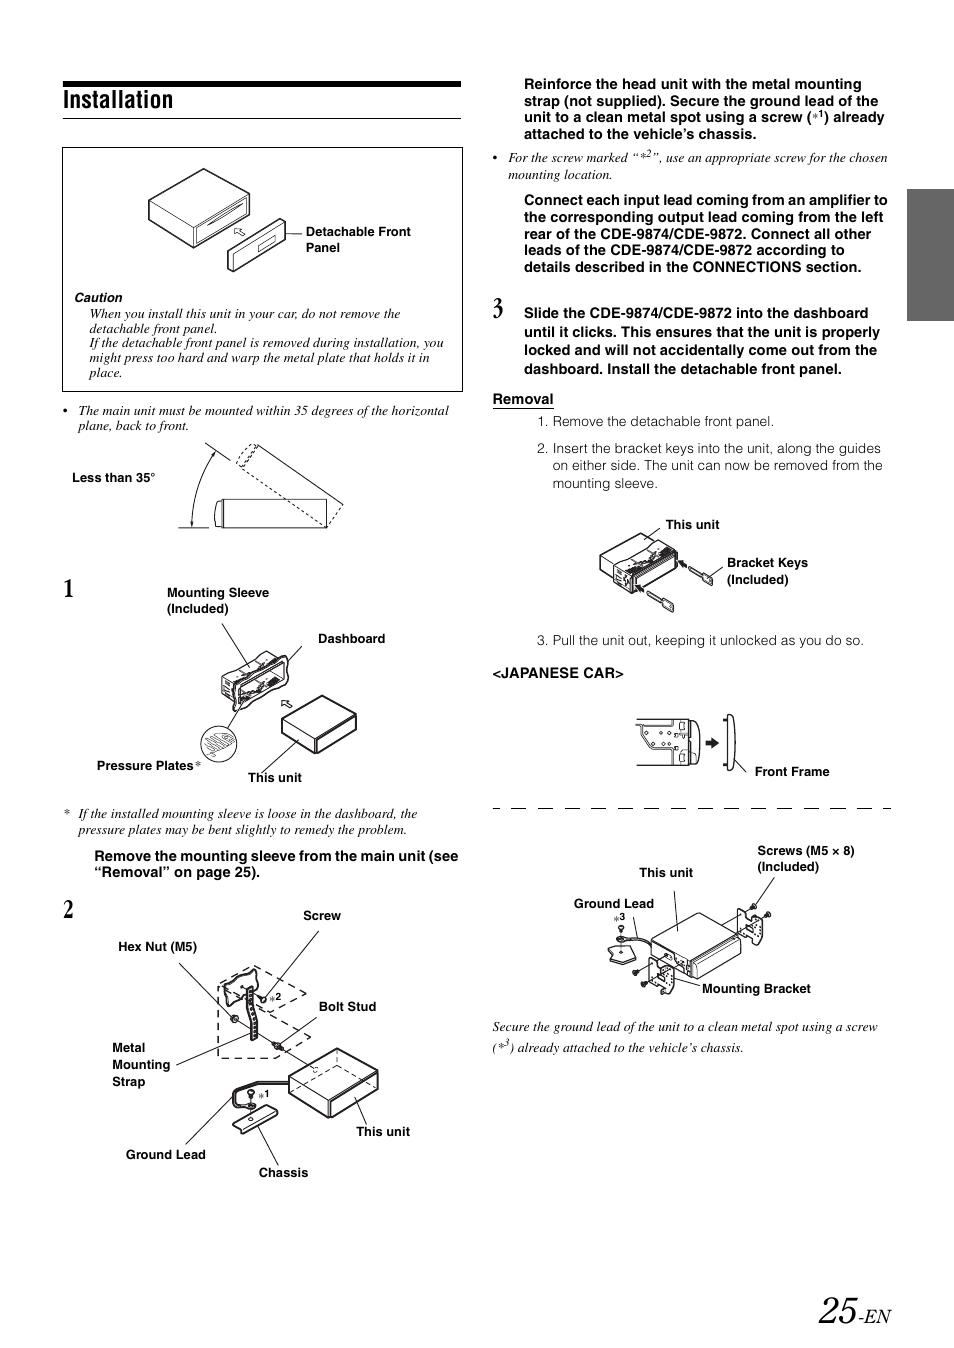 [DIAGRAM_38ZD]  713EBB Alpine Cde 9874 Wiring Diagram | Wiring Library | Alpine Cde 9874 Wiring Diagram |  | Wiring Library